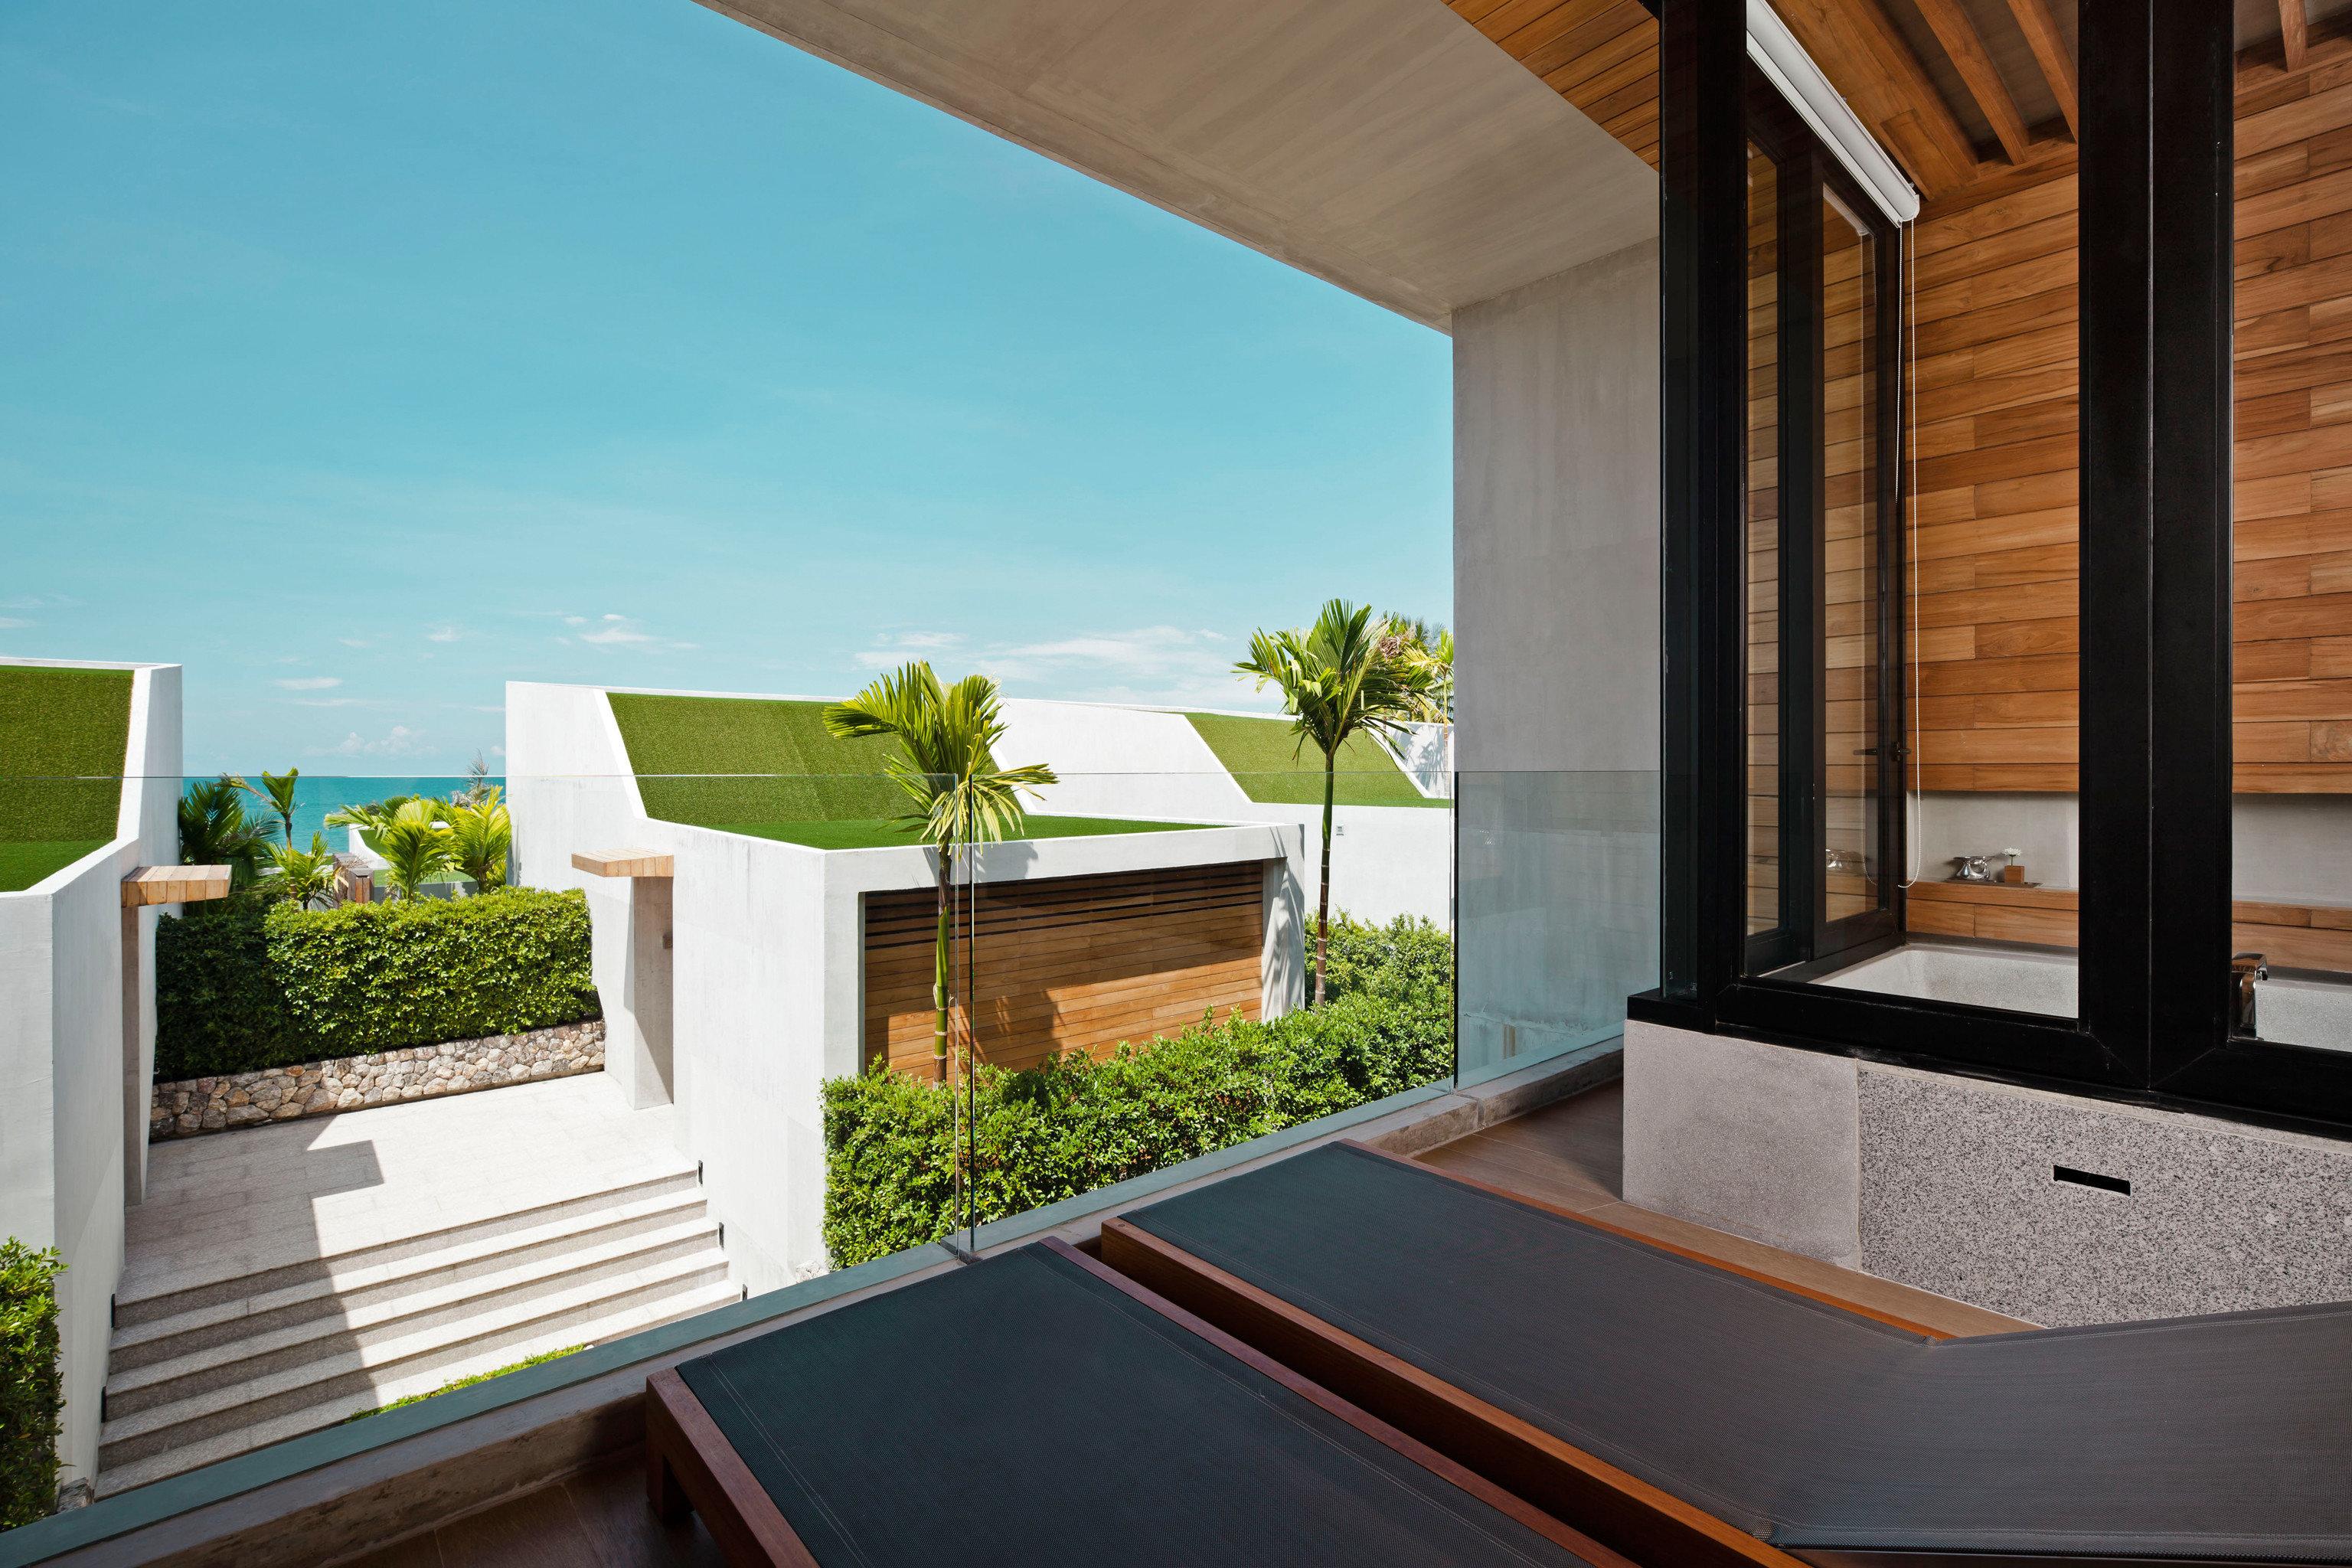 Beachfront Hip Modern Romantic Scenic views house property home Architecture professional Villa daylighting swimming pool condominium backyard